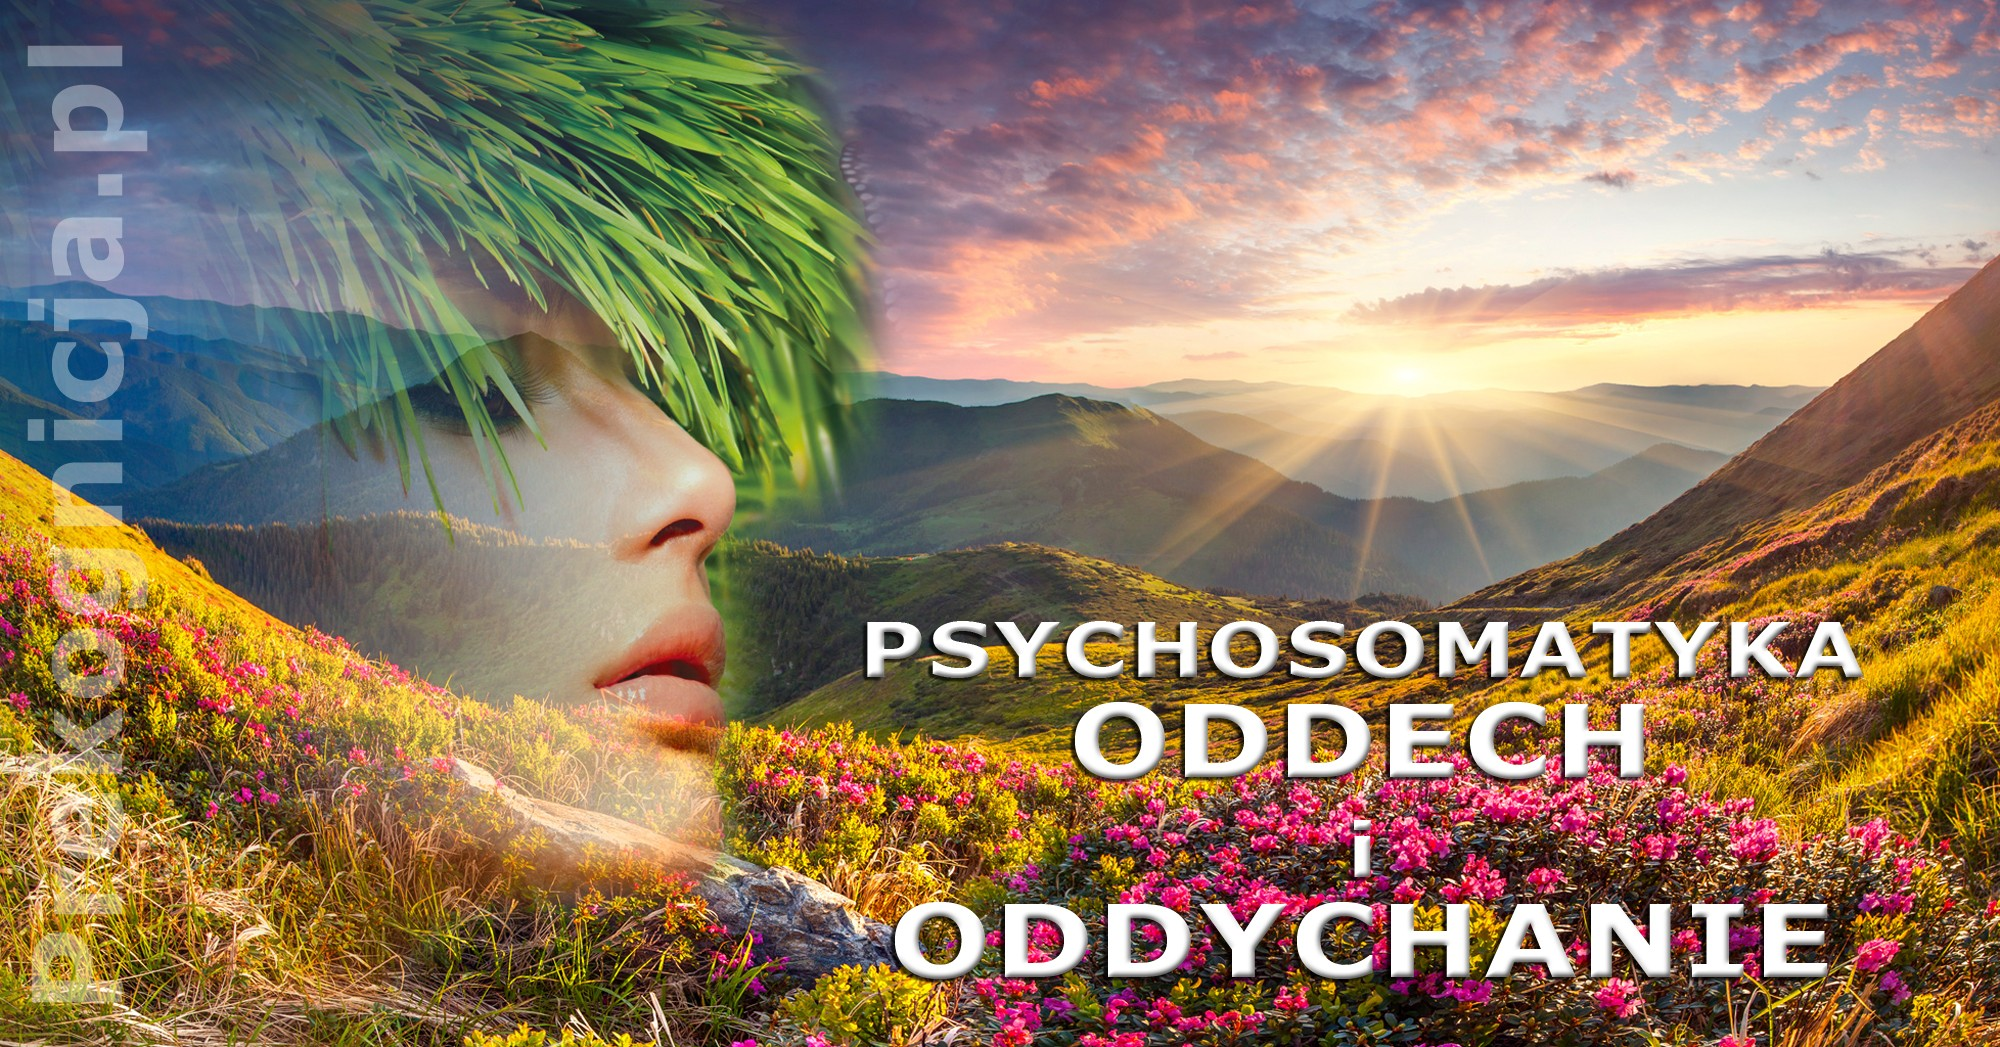 Psychosomatyka - choroby oddechu i oddychania